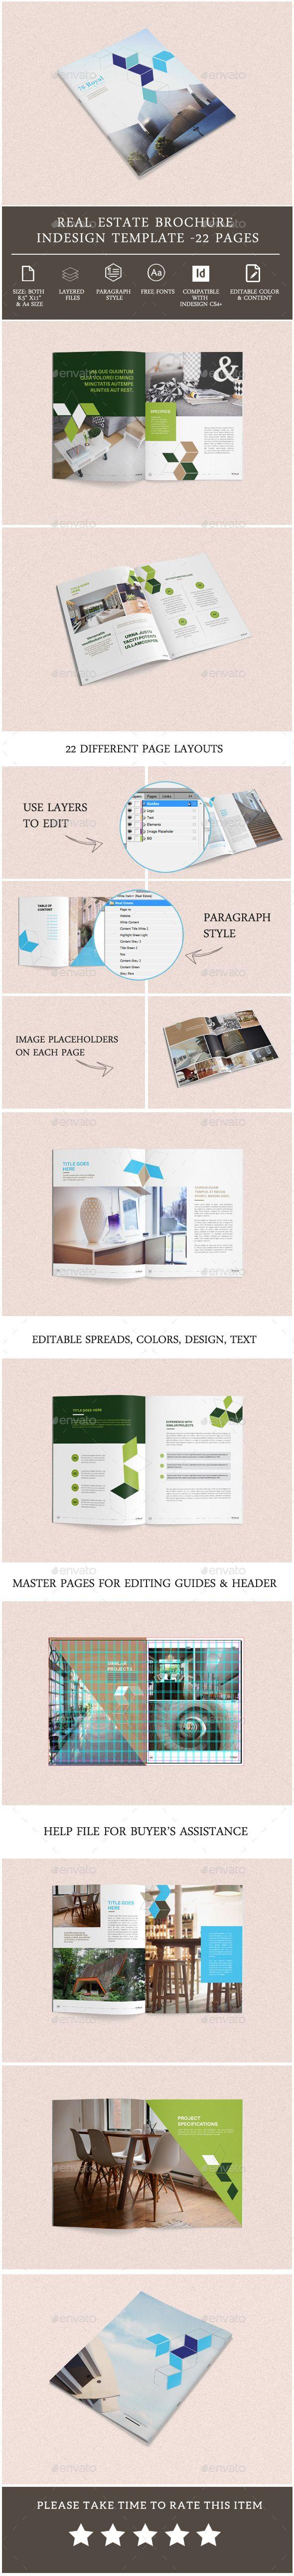 Real Estate Brochure Template  Brochure Template Brochures And